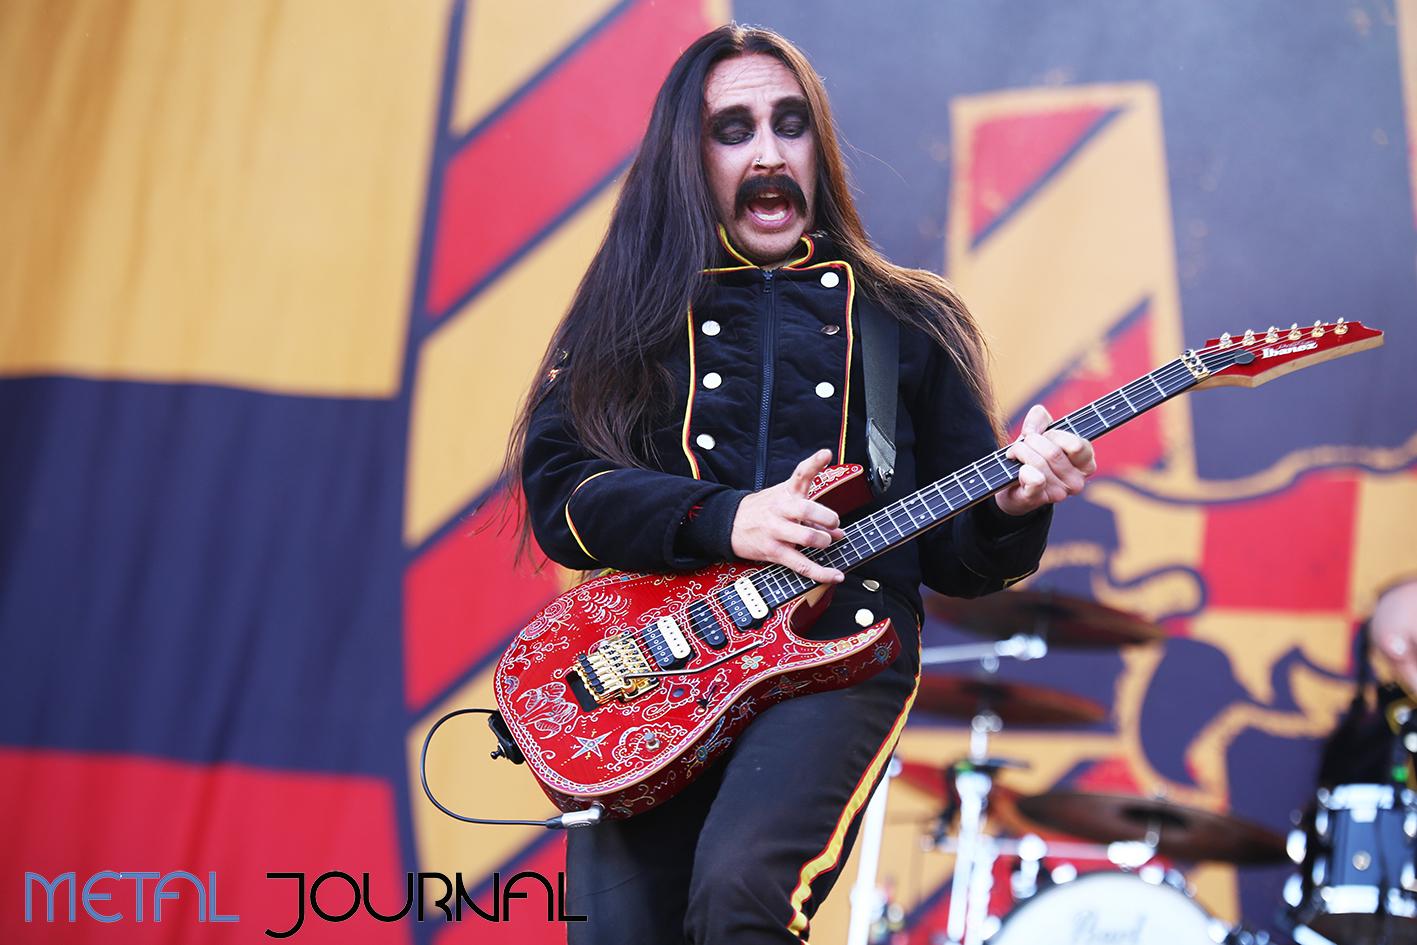 avatar - leyendas del rock 2019 metal journal pic 8